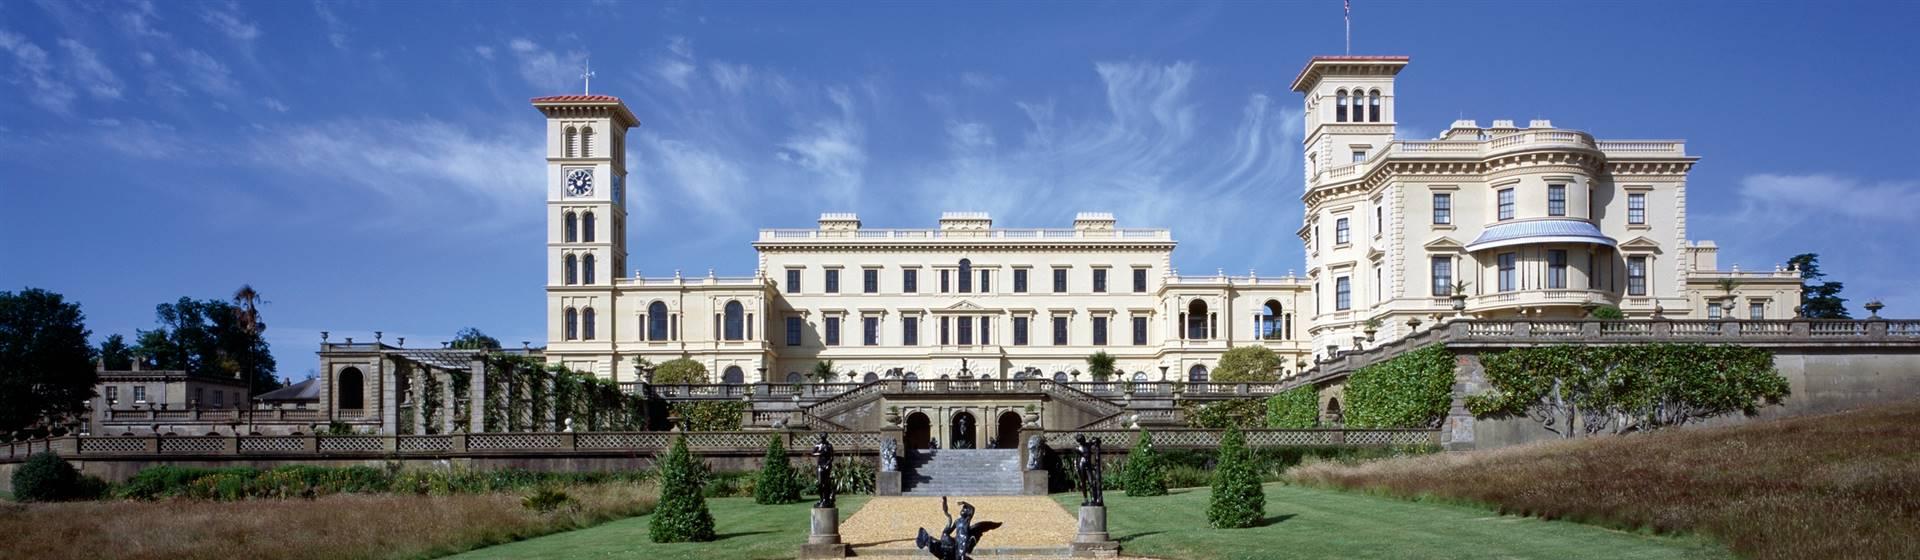 Isle of Wight & Osborne House